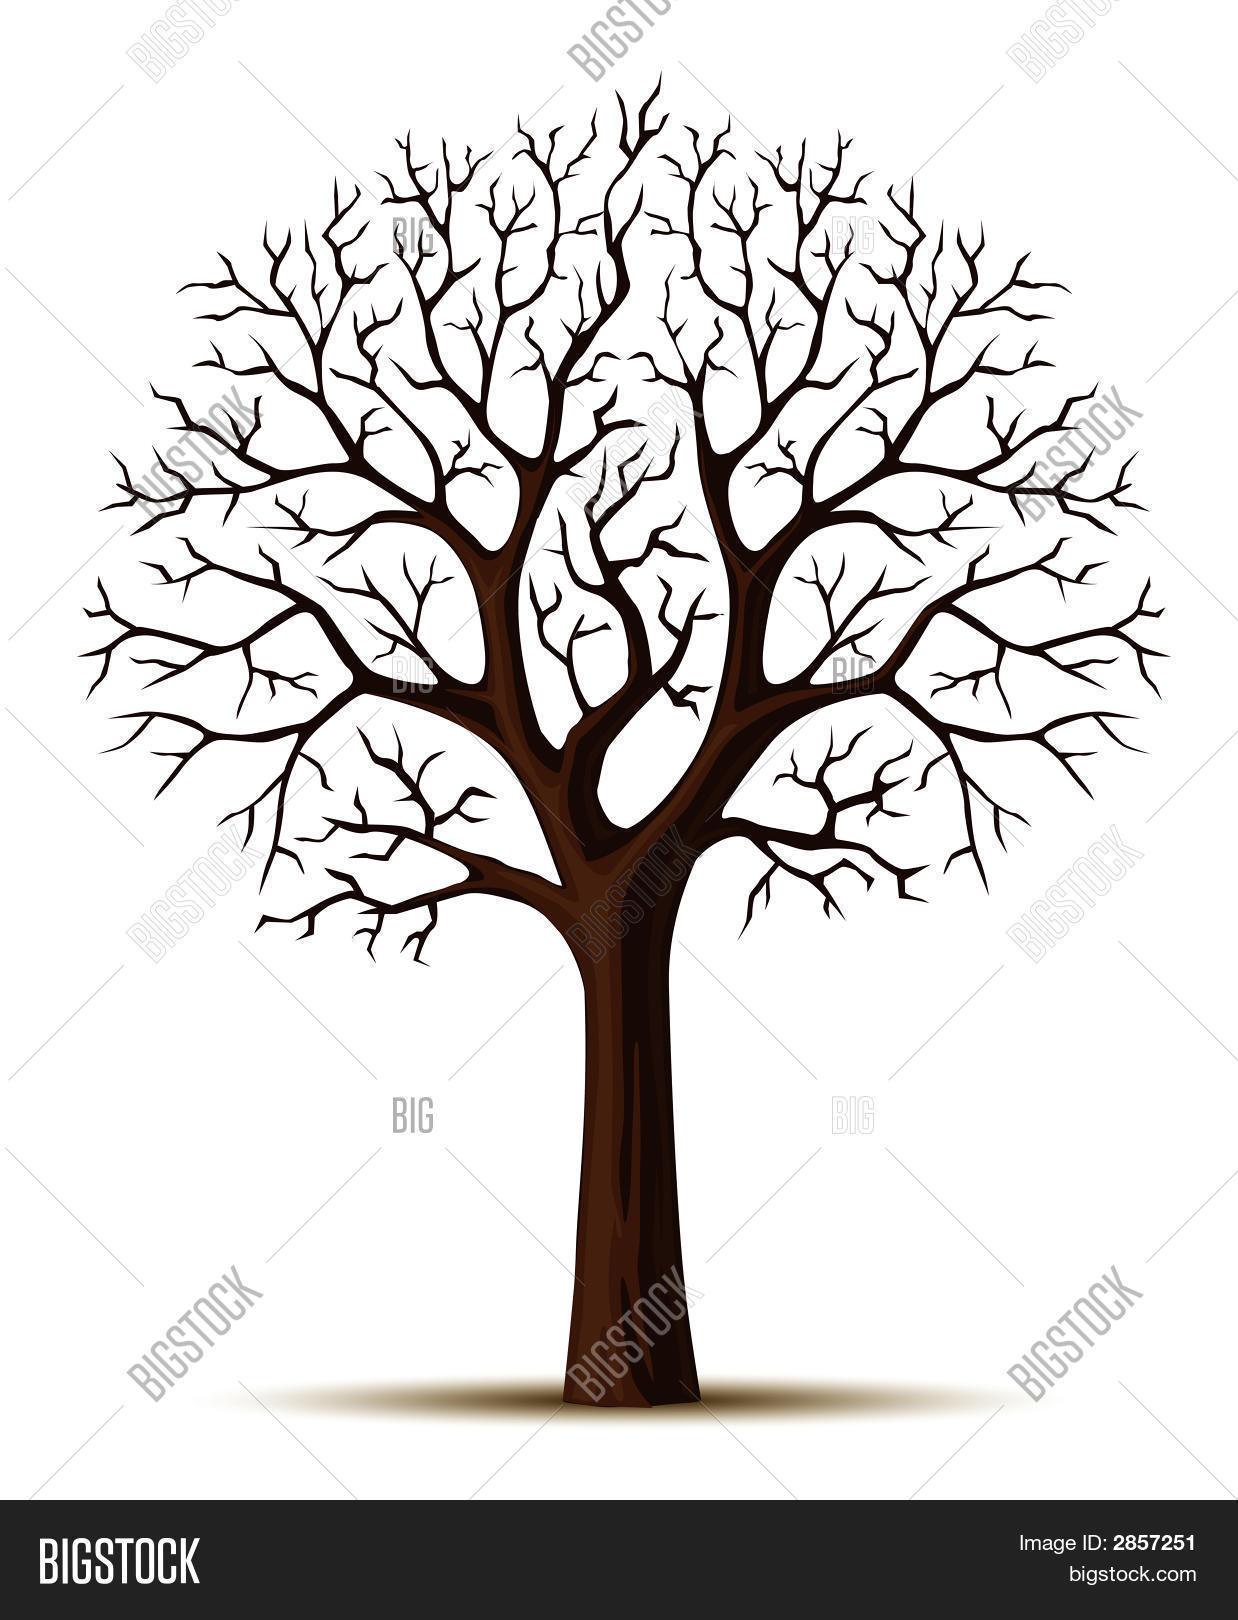 Tree Trunk Images Illustrations Vectors Free Bigstock